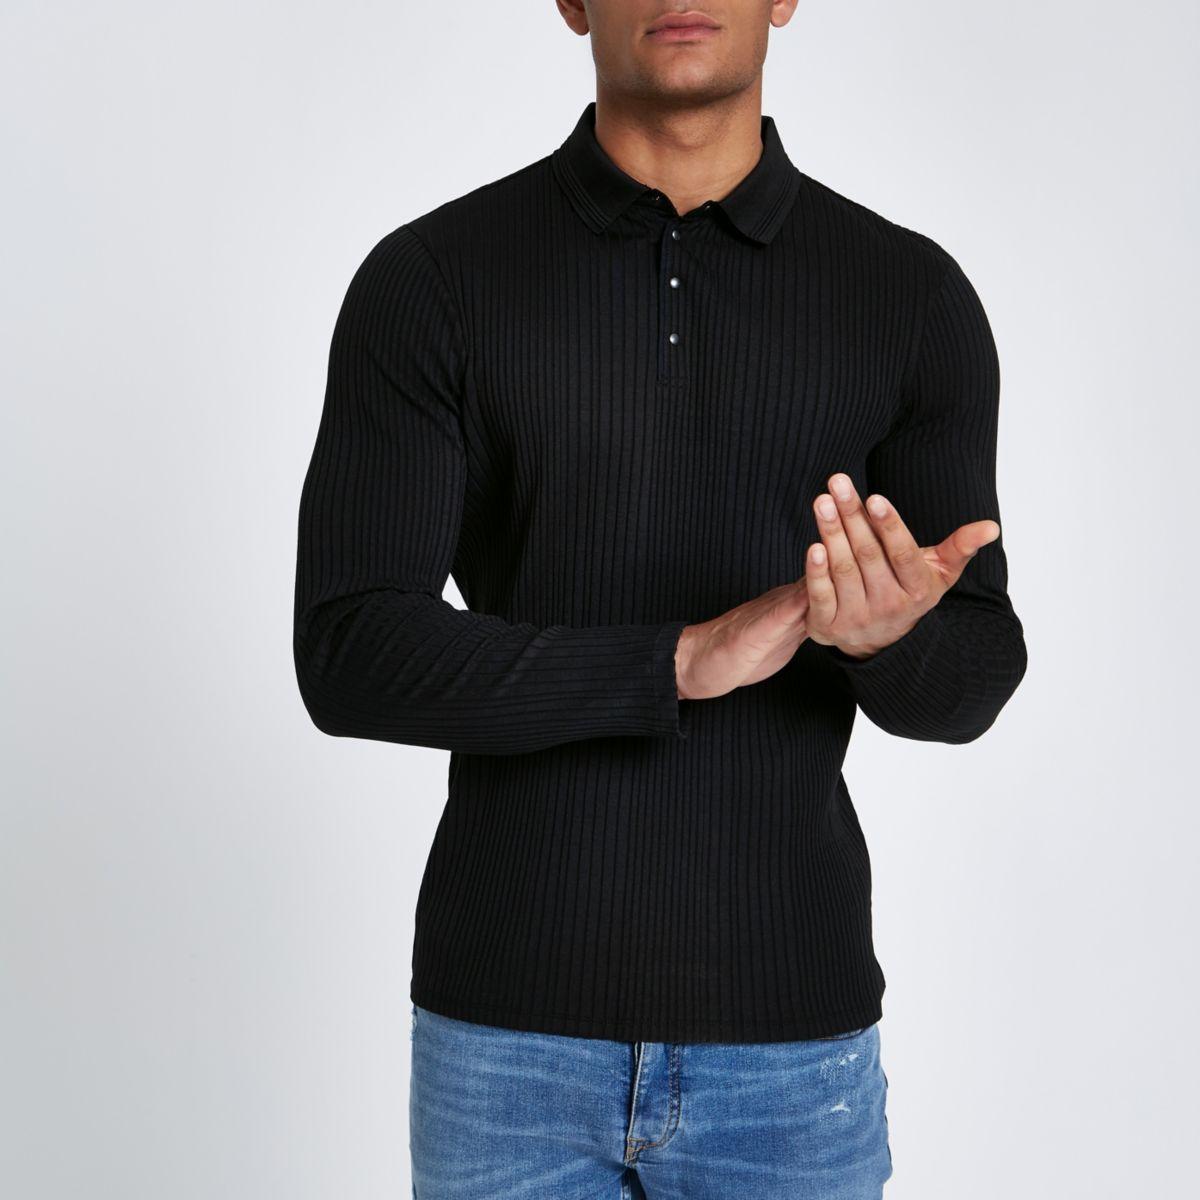 Polo Chunky Black Muscle Rib Shirt Fit Oxwspya For Bernardi Burger Polos 6 Bj